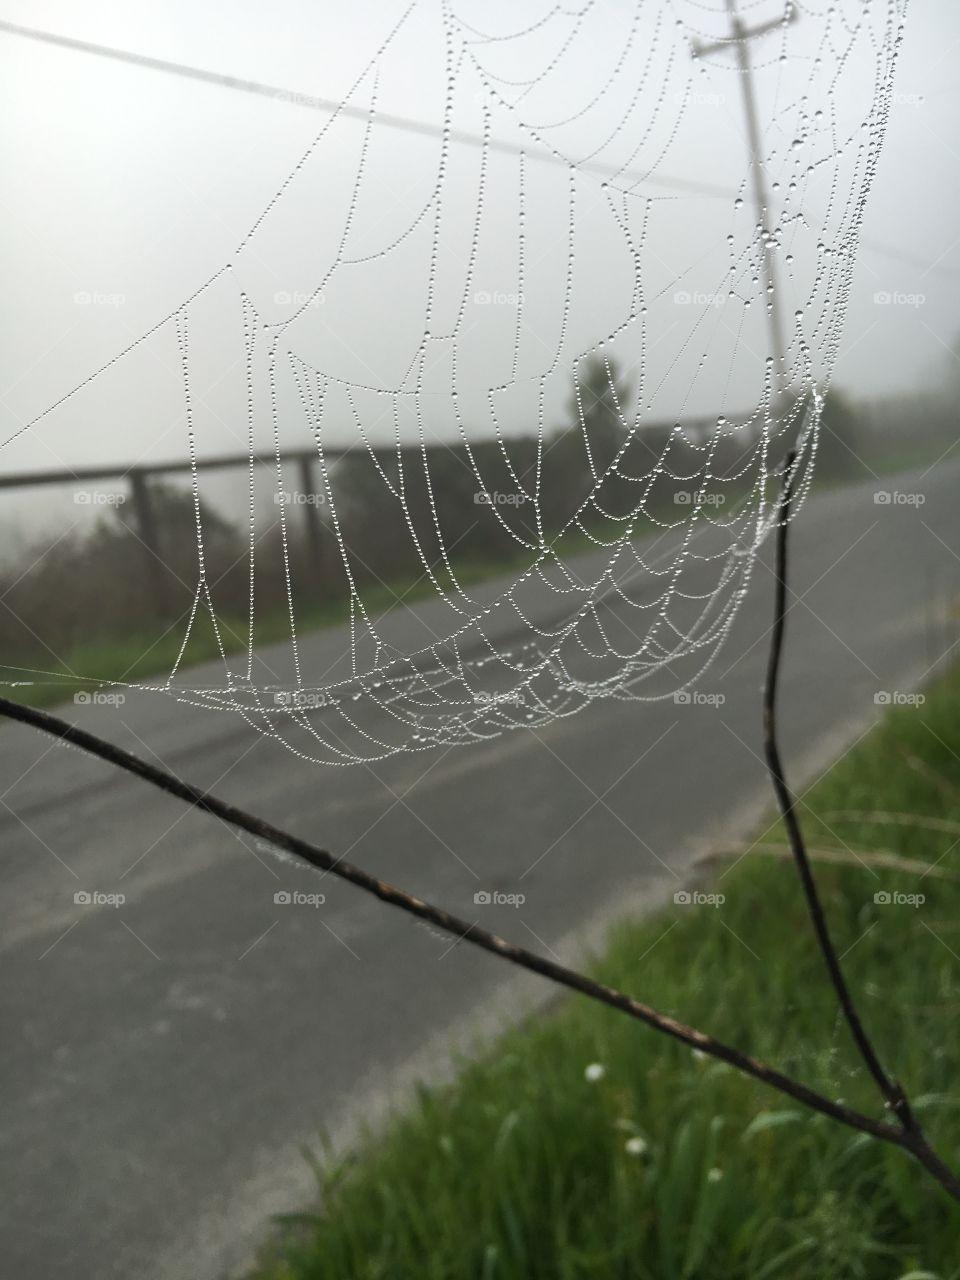 Spiderweb morning dew